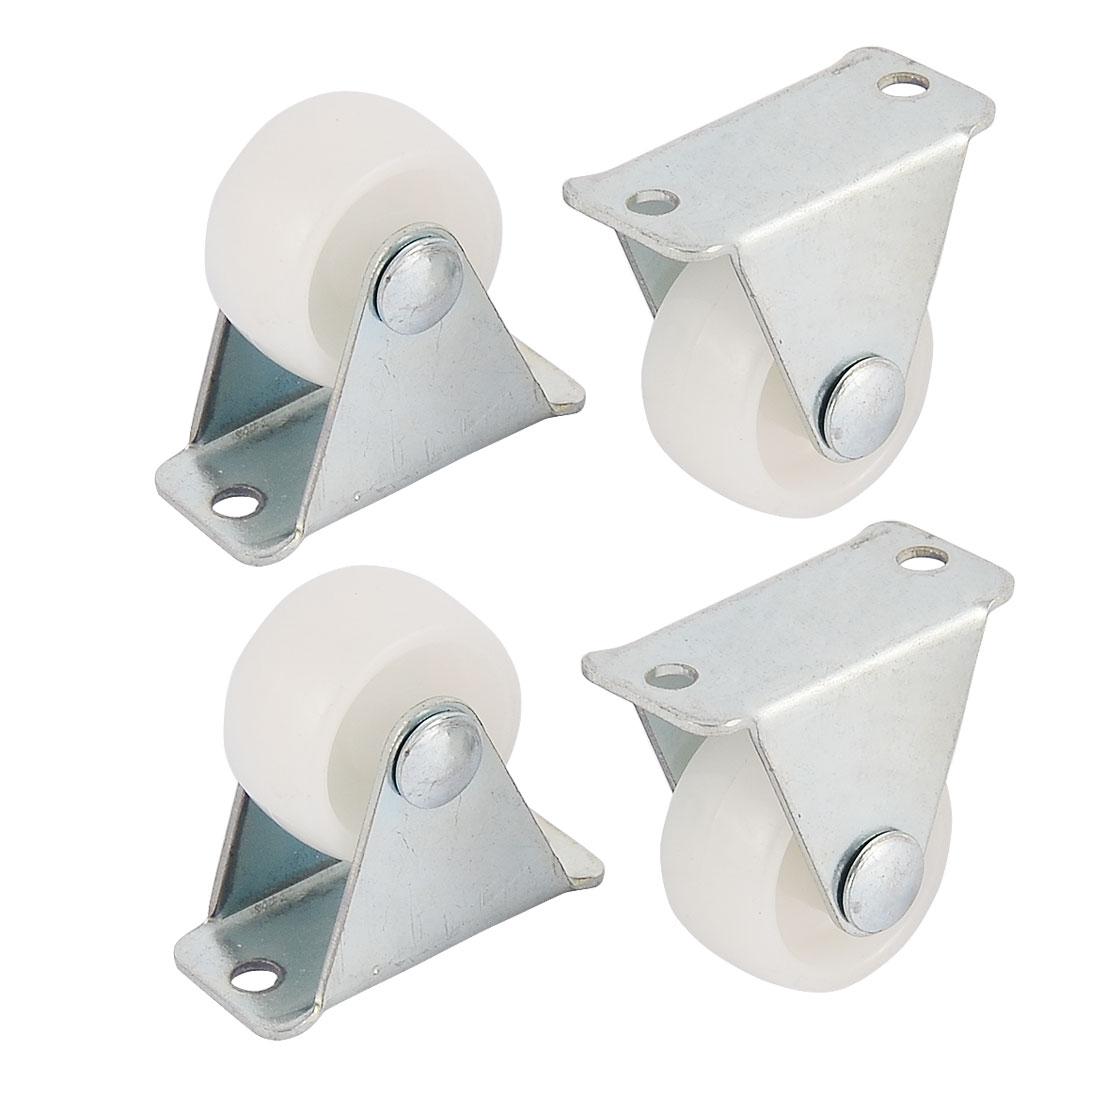 Metal Top Plate 1 Inch Dia Rigid Fixed Caster Hard Plastic Wheels White 4pcs